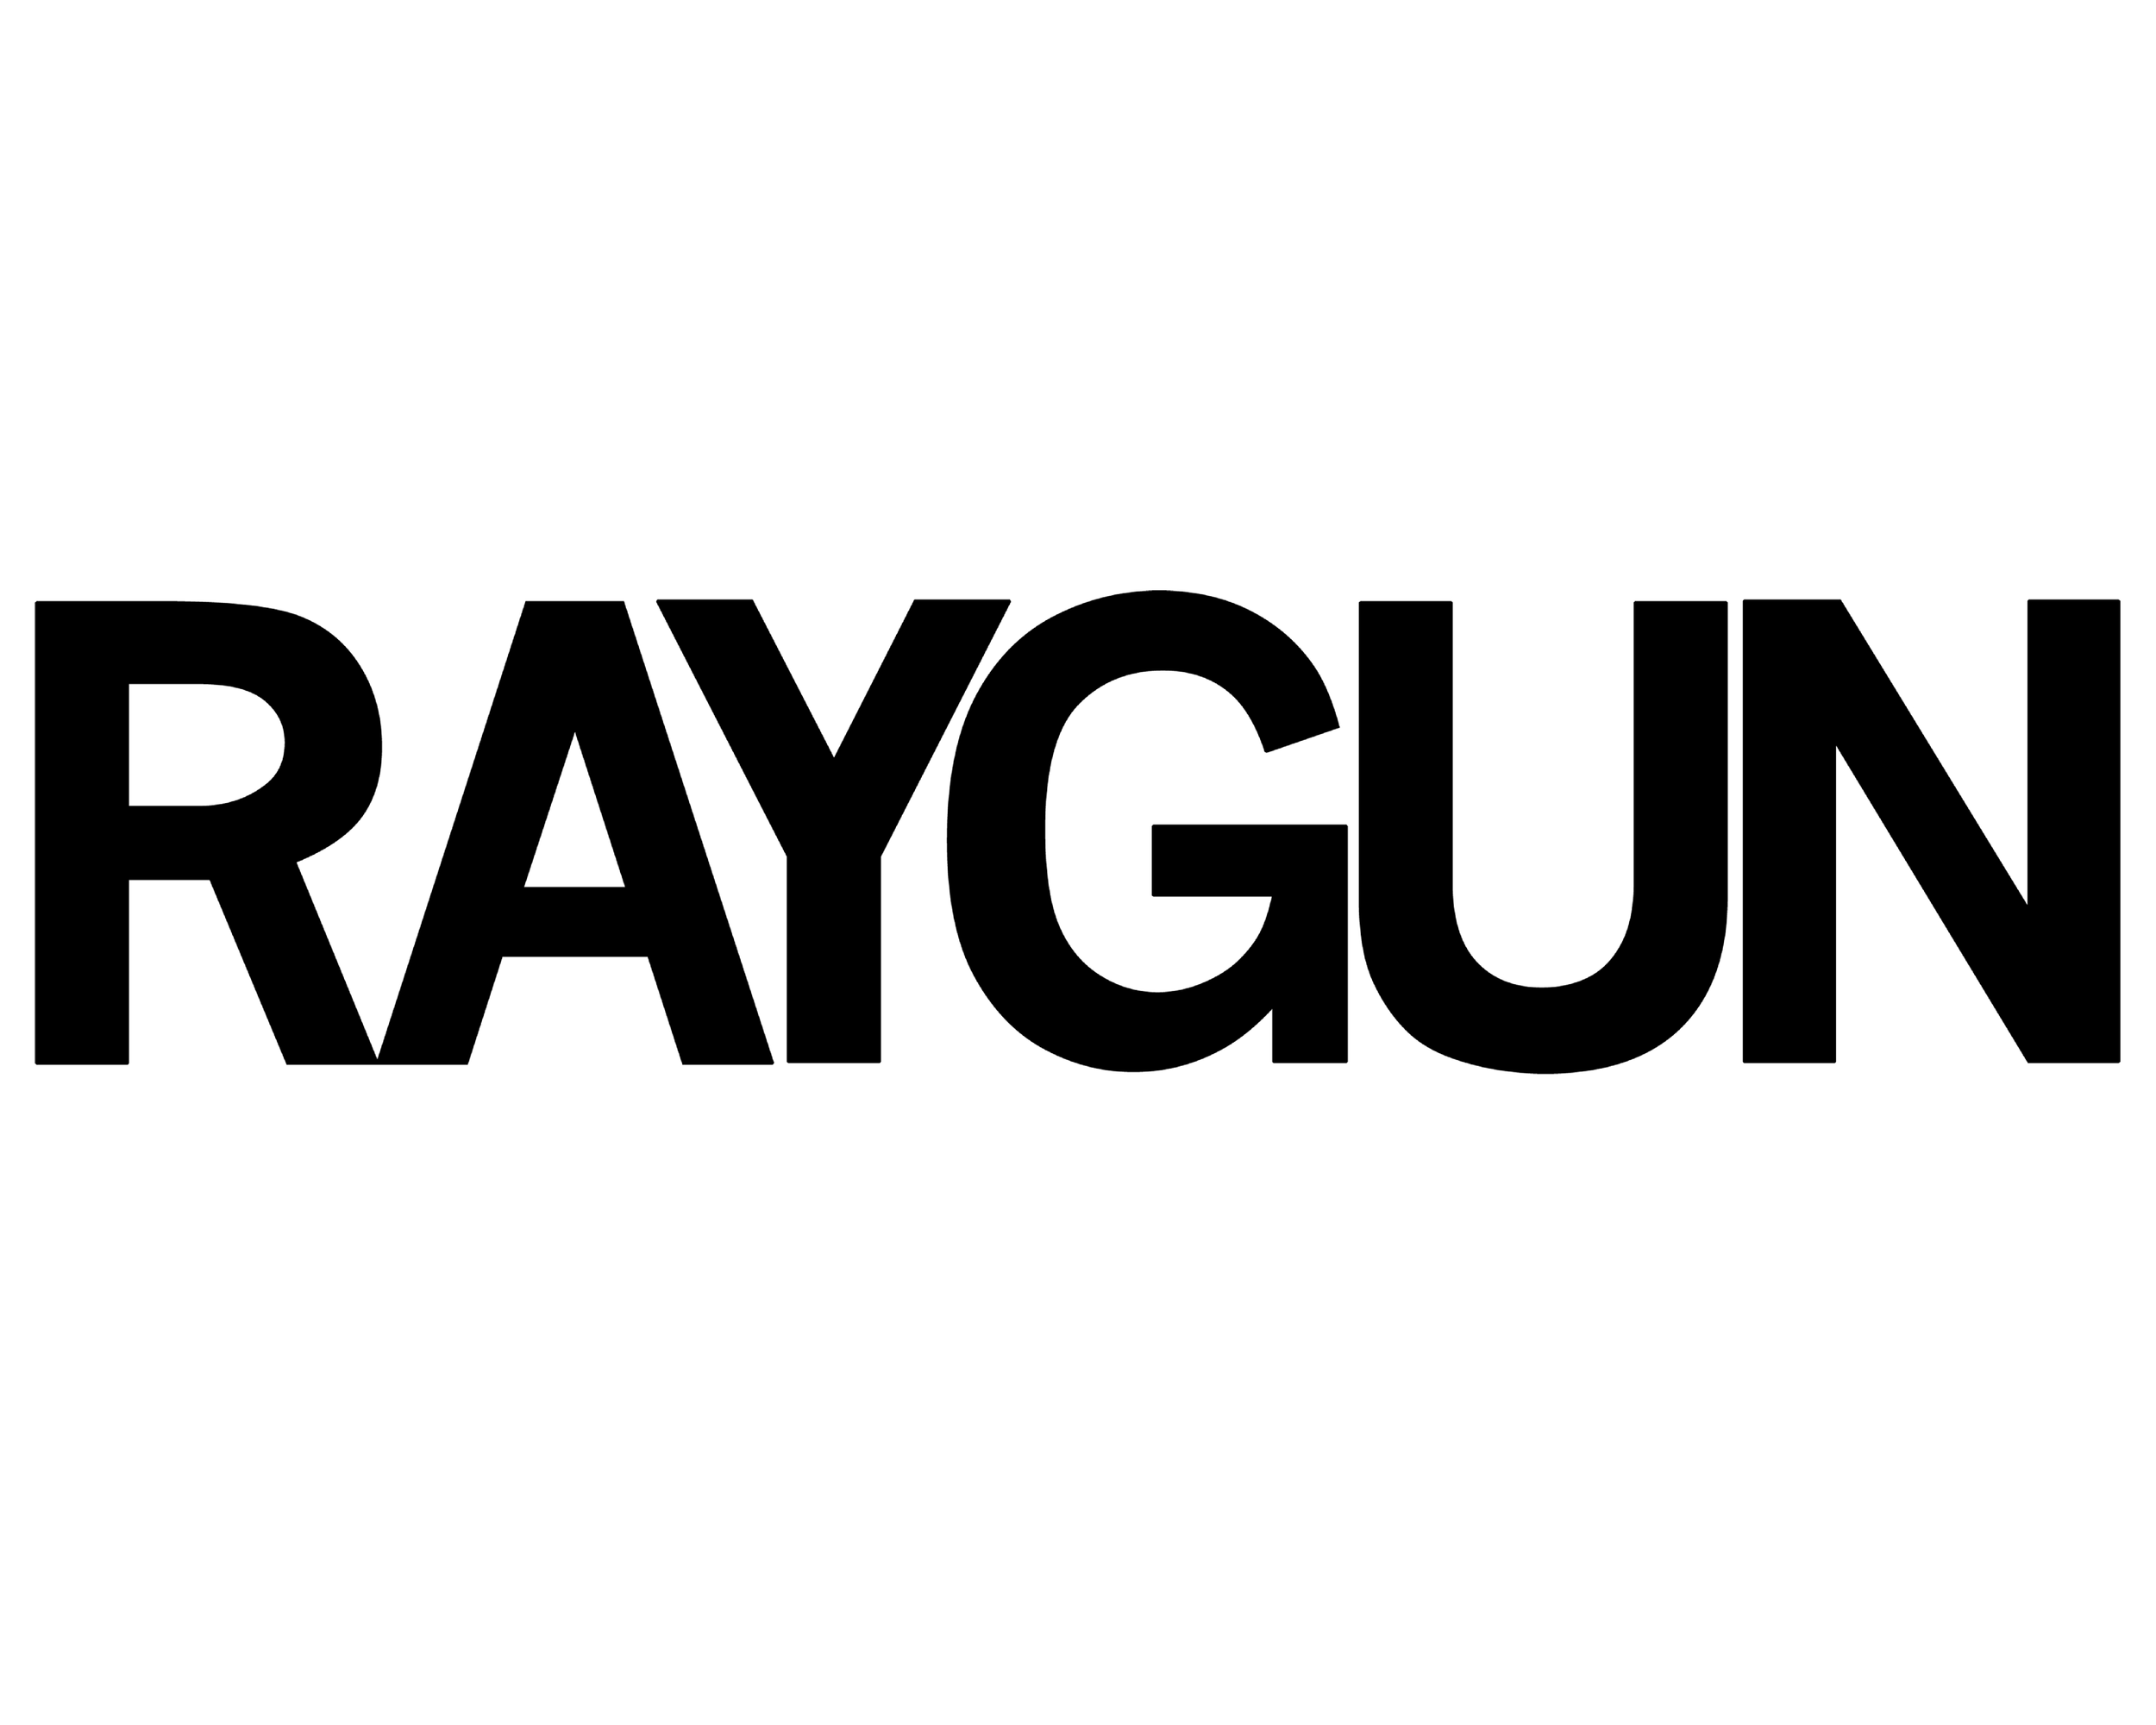 Raygun.png